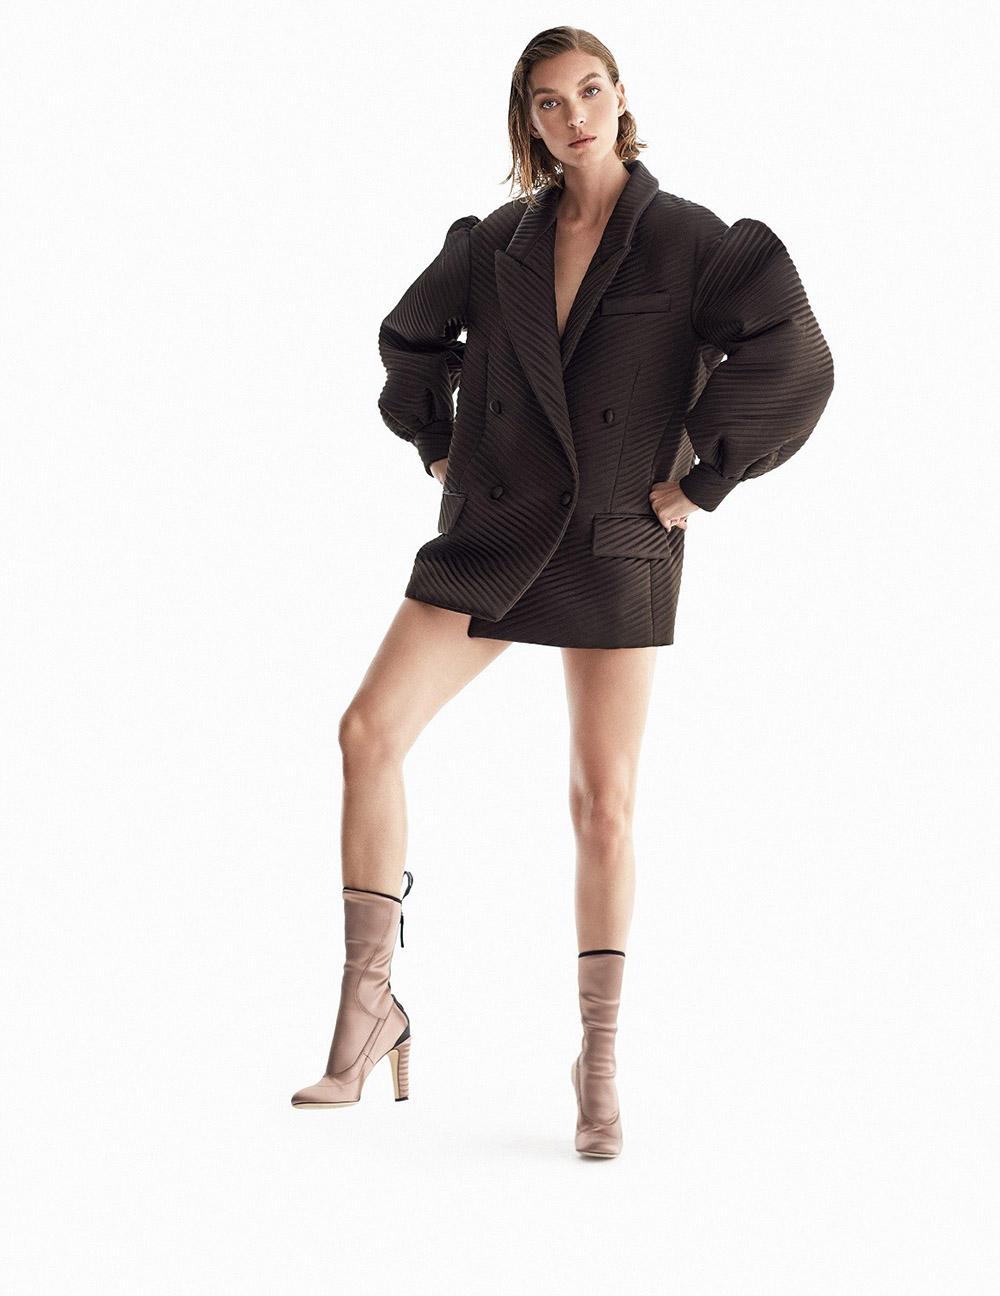 Arizona Muse covers Harper's Bazaar Spain September 2020 by Xavi Gordo